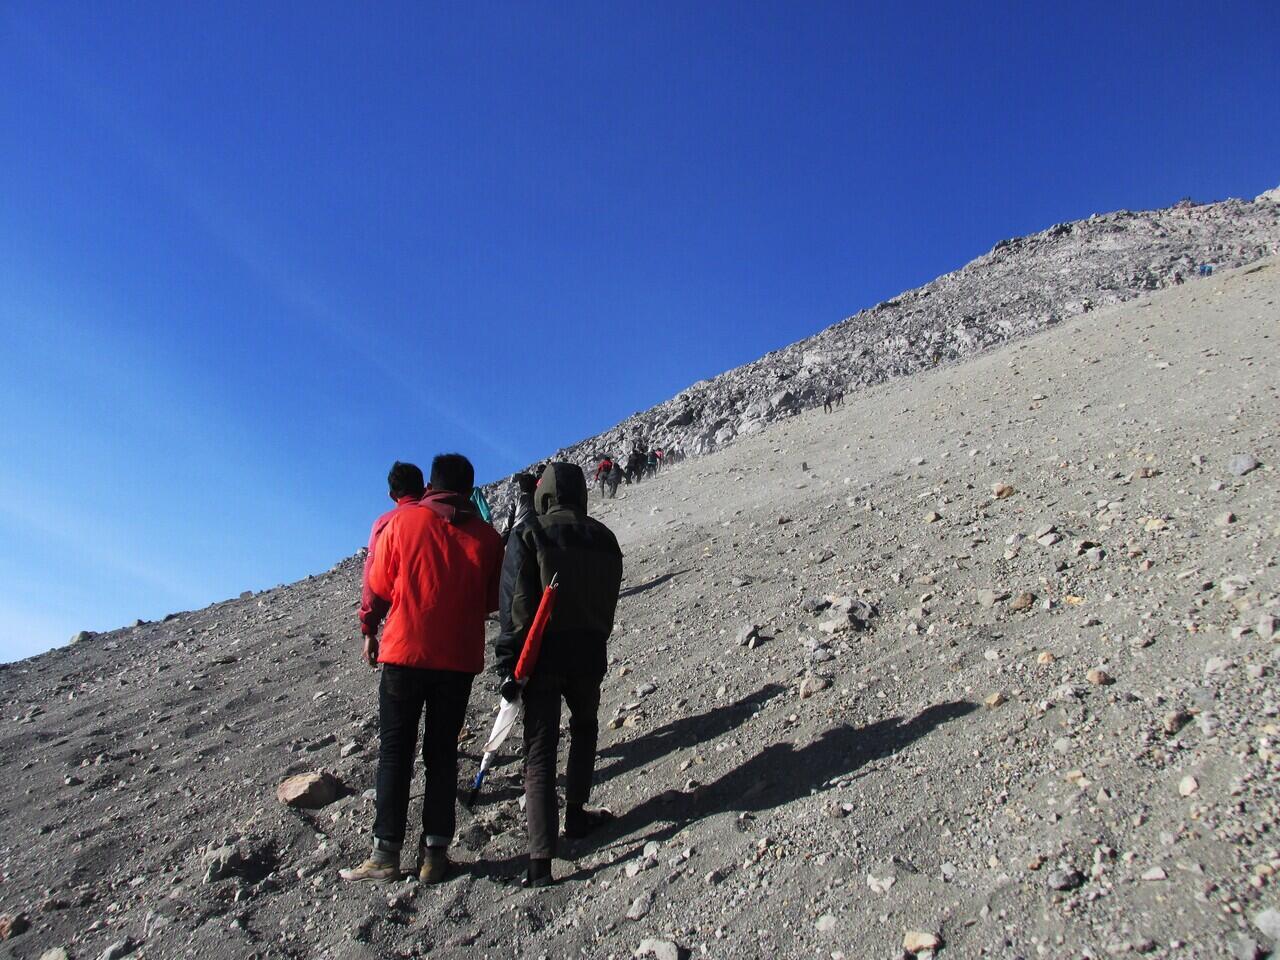 Agan Perlu Tahu ! Inilah 11 Larangan Saat Melakukan Pendakian Gunung